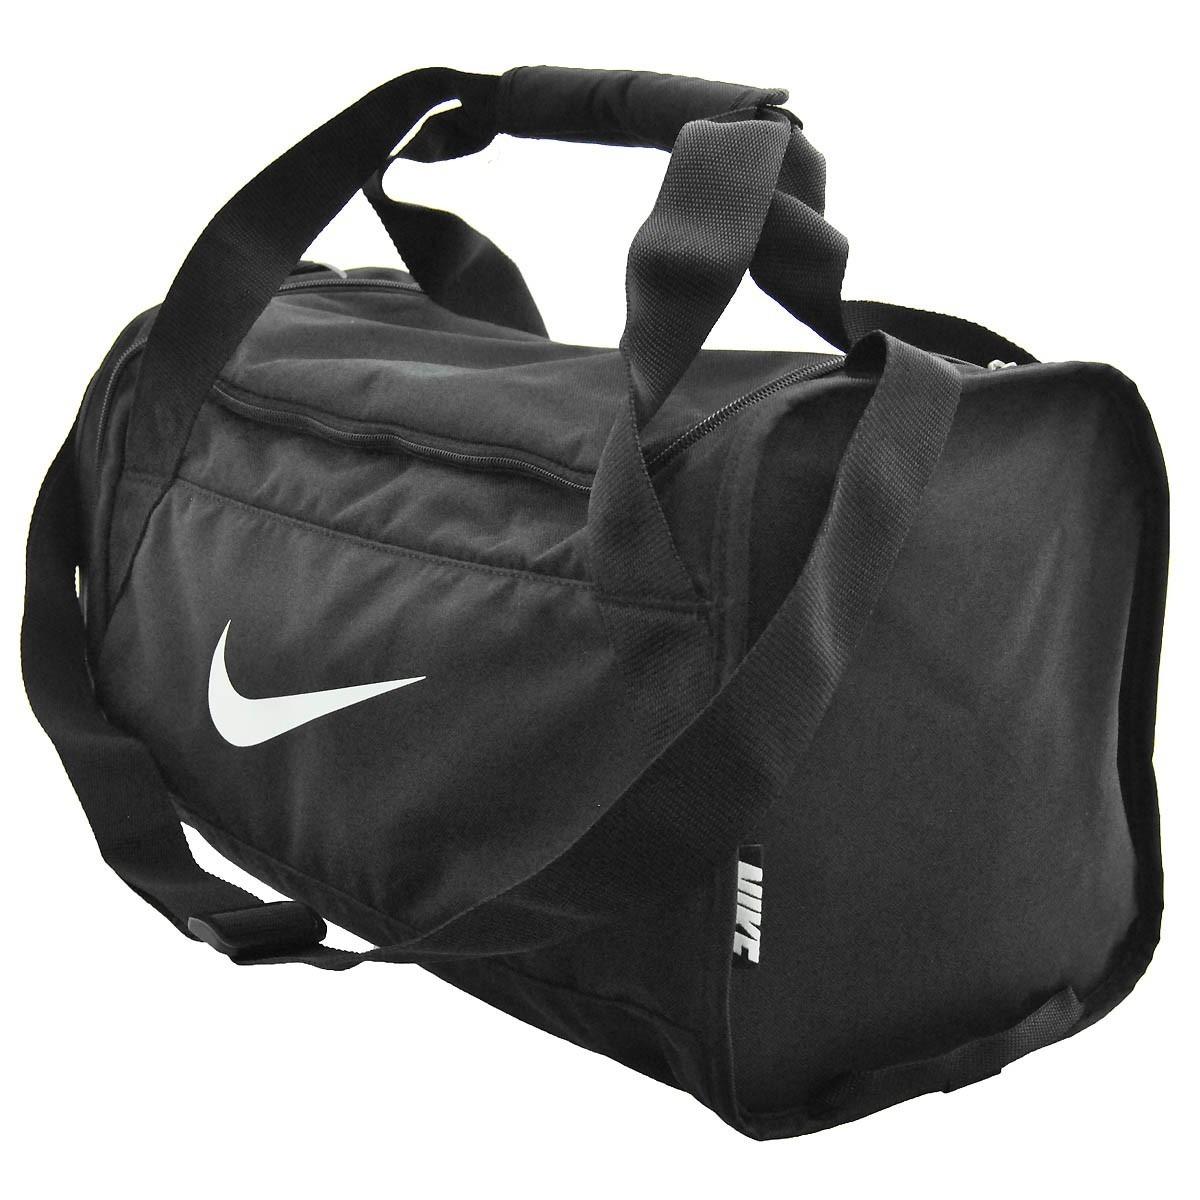 999 Brasilia Bolso Mercado Nike 6 Dufell Libre 00 Small En XU4qU